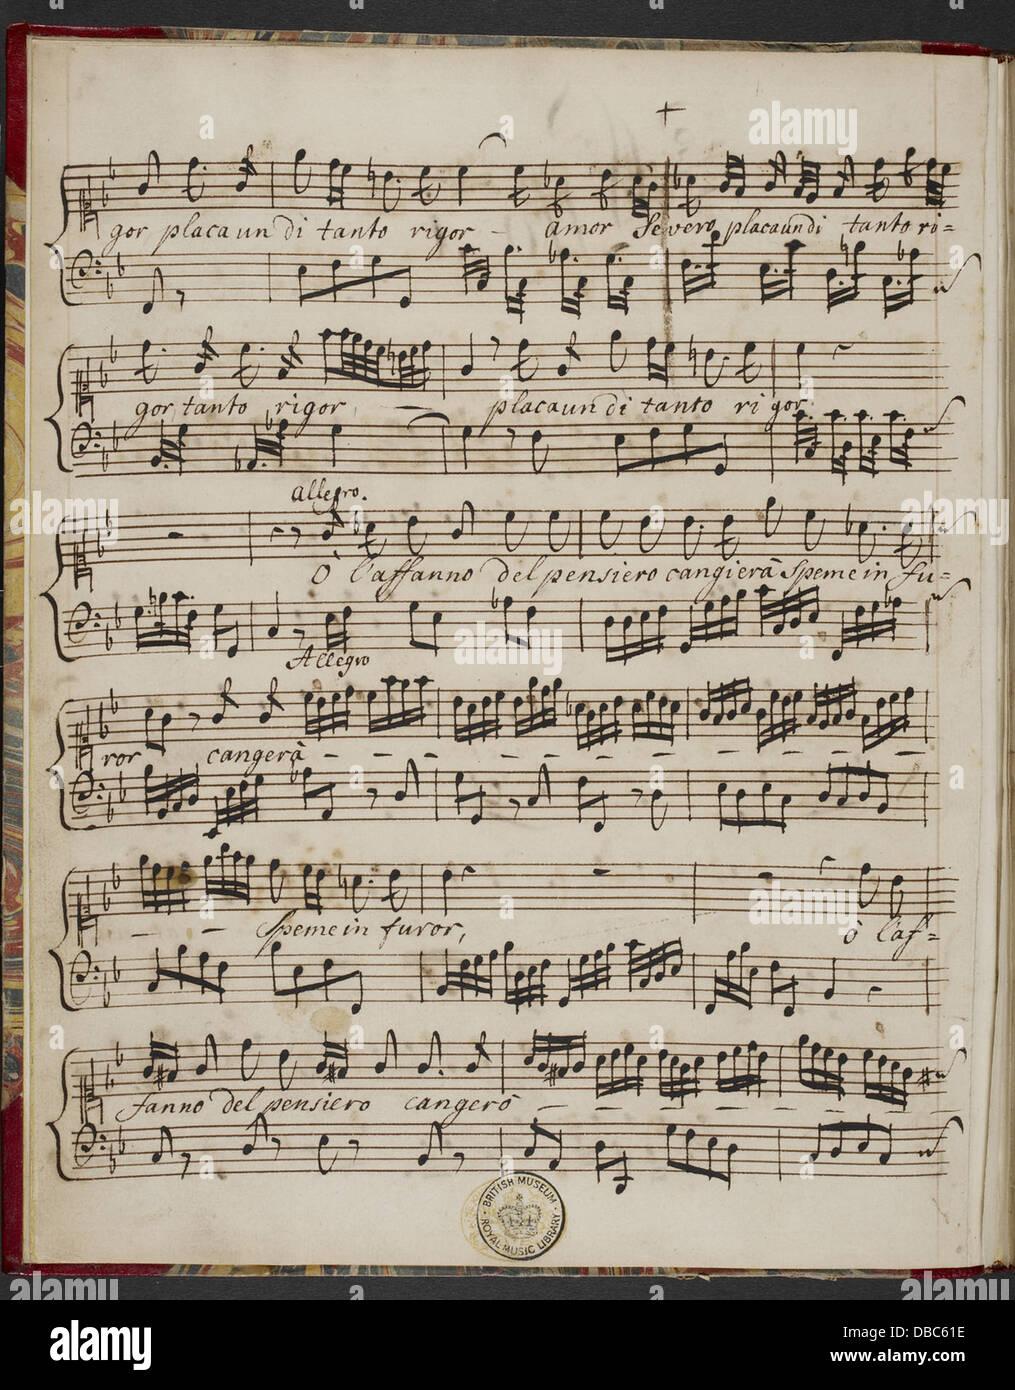 Händel - Il Pastor Fido. (BL R.M.19.e.4 F. 1v) Stockbild